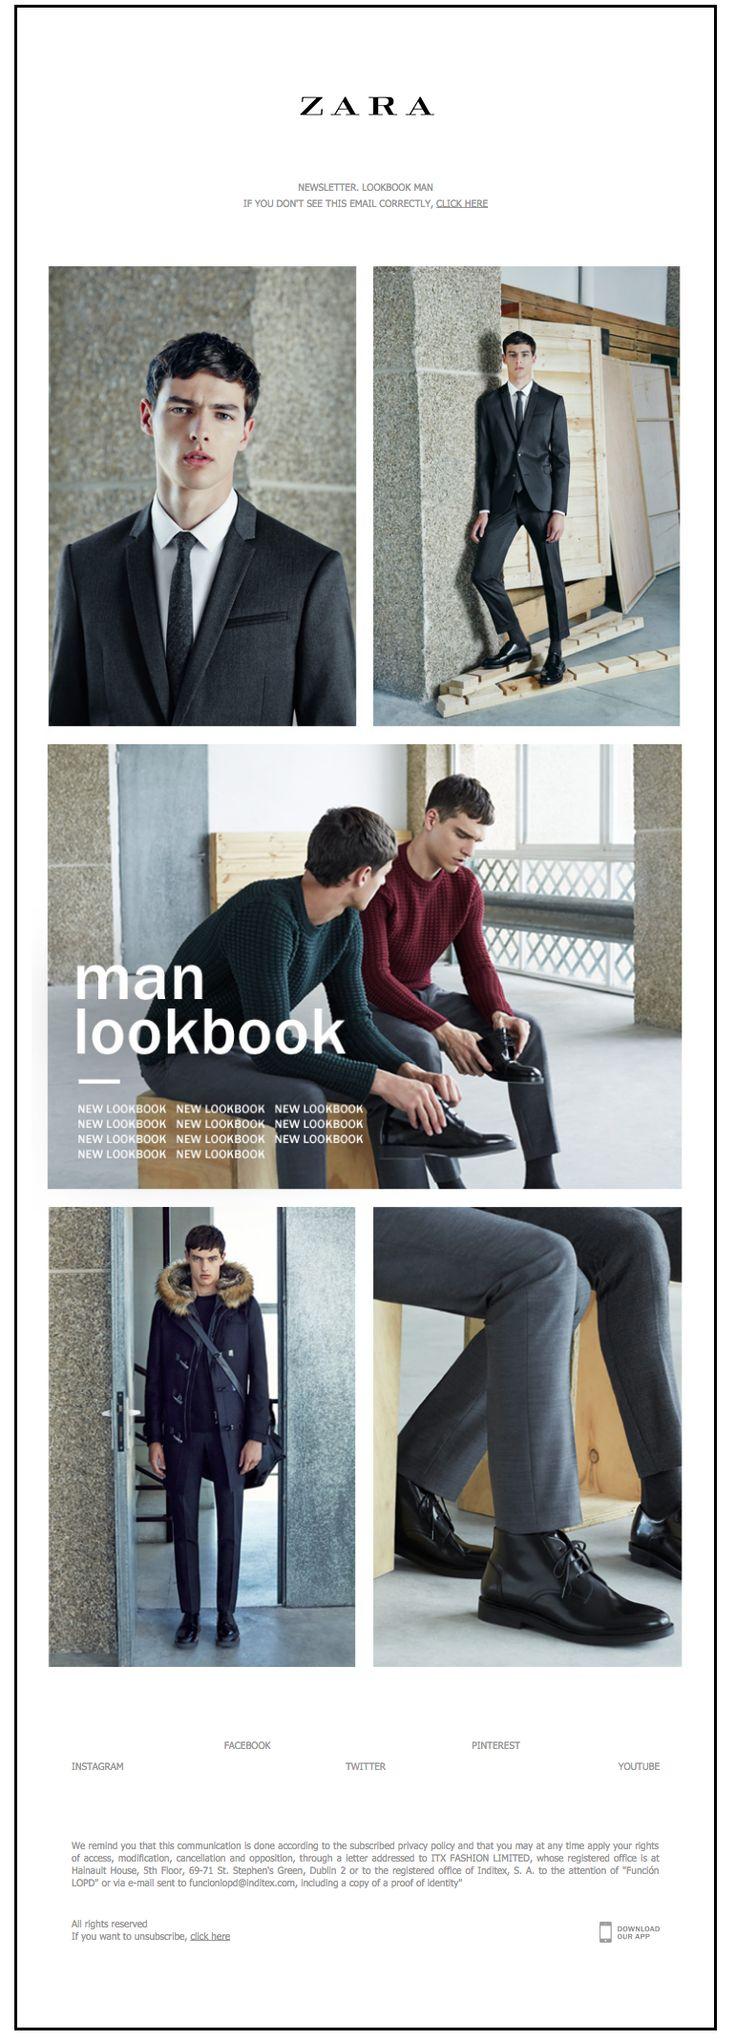 Zara poster design - Zara Newsletter New Lookbook Man September